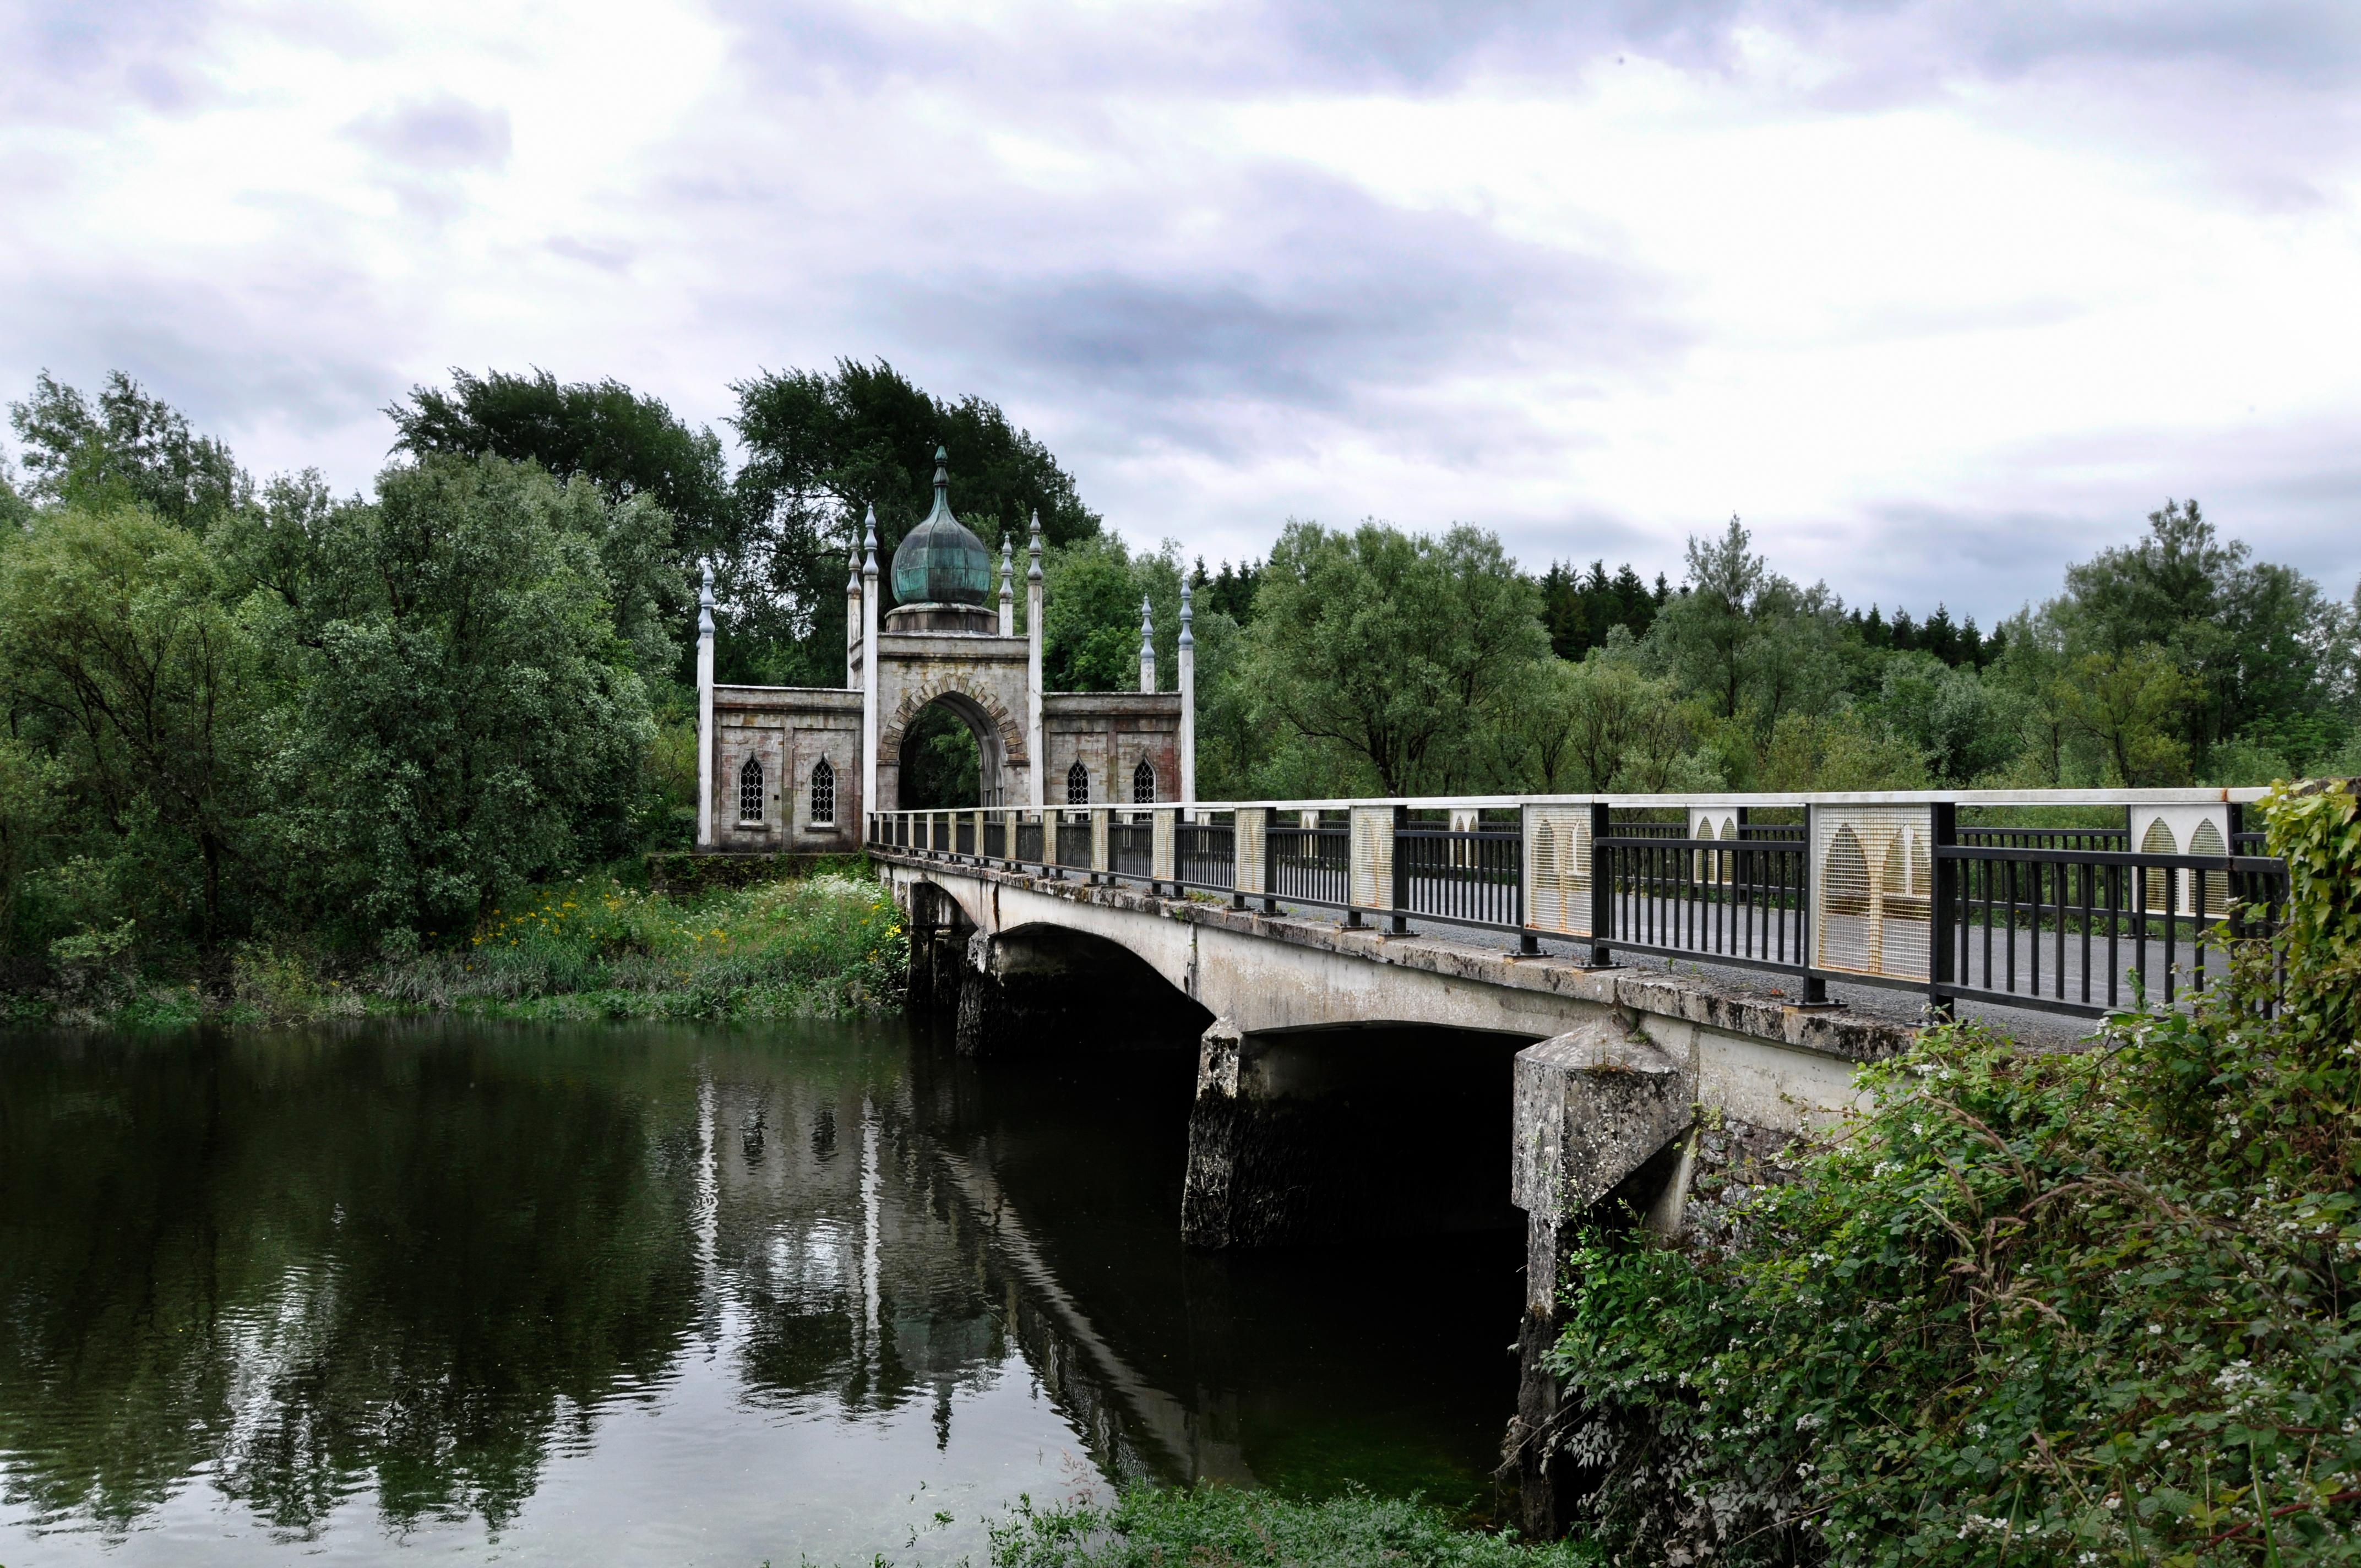 Flickr - The Bridge